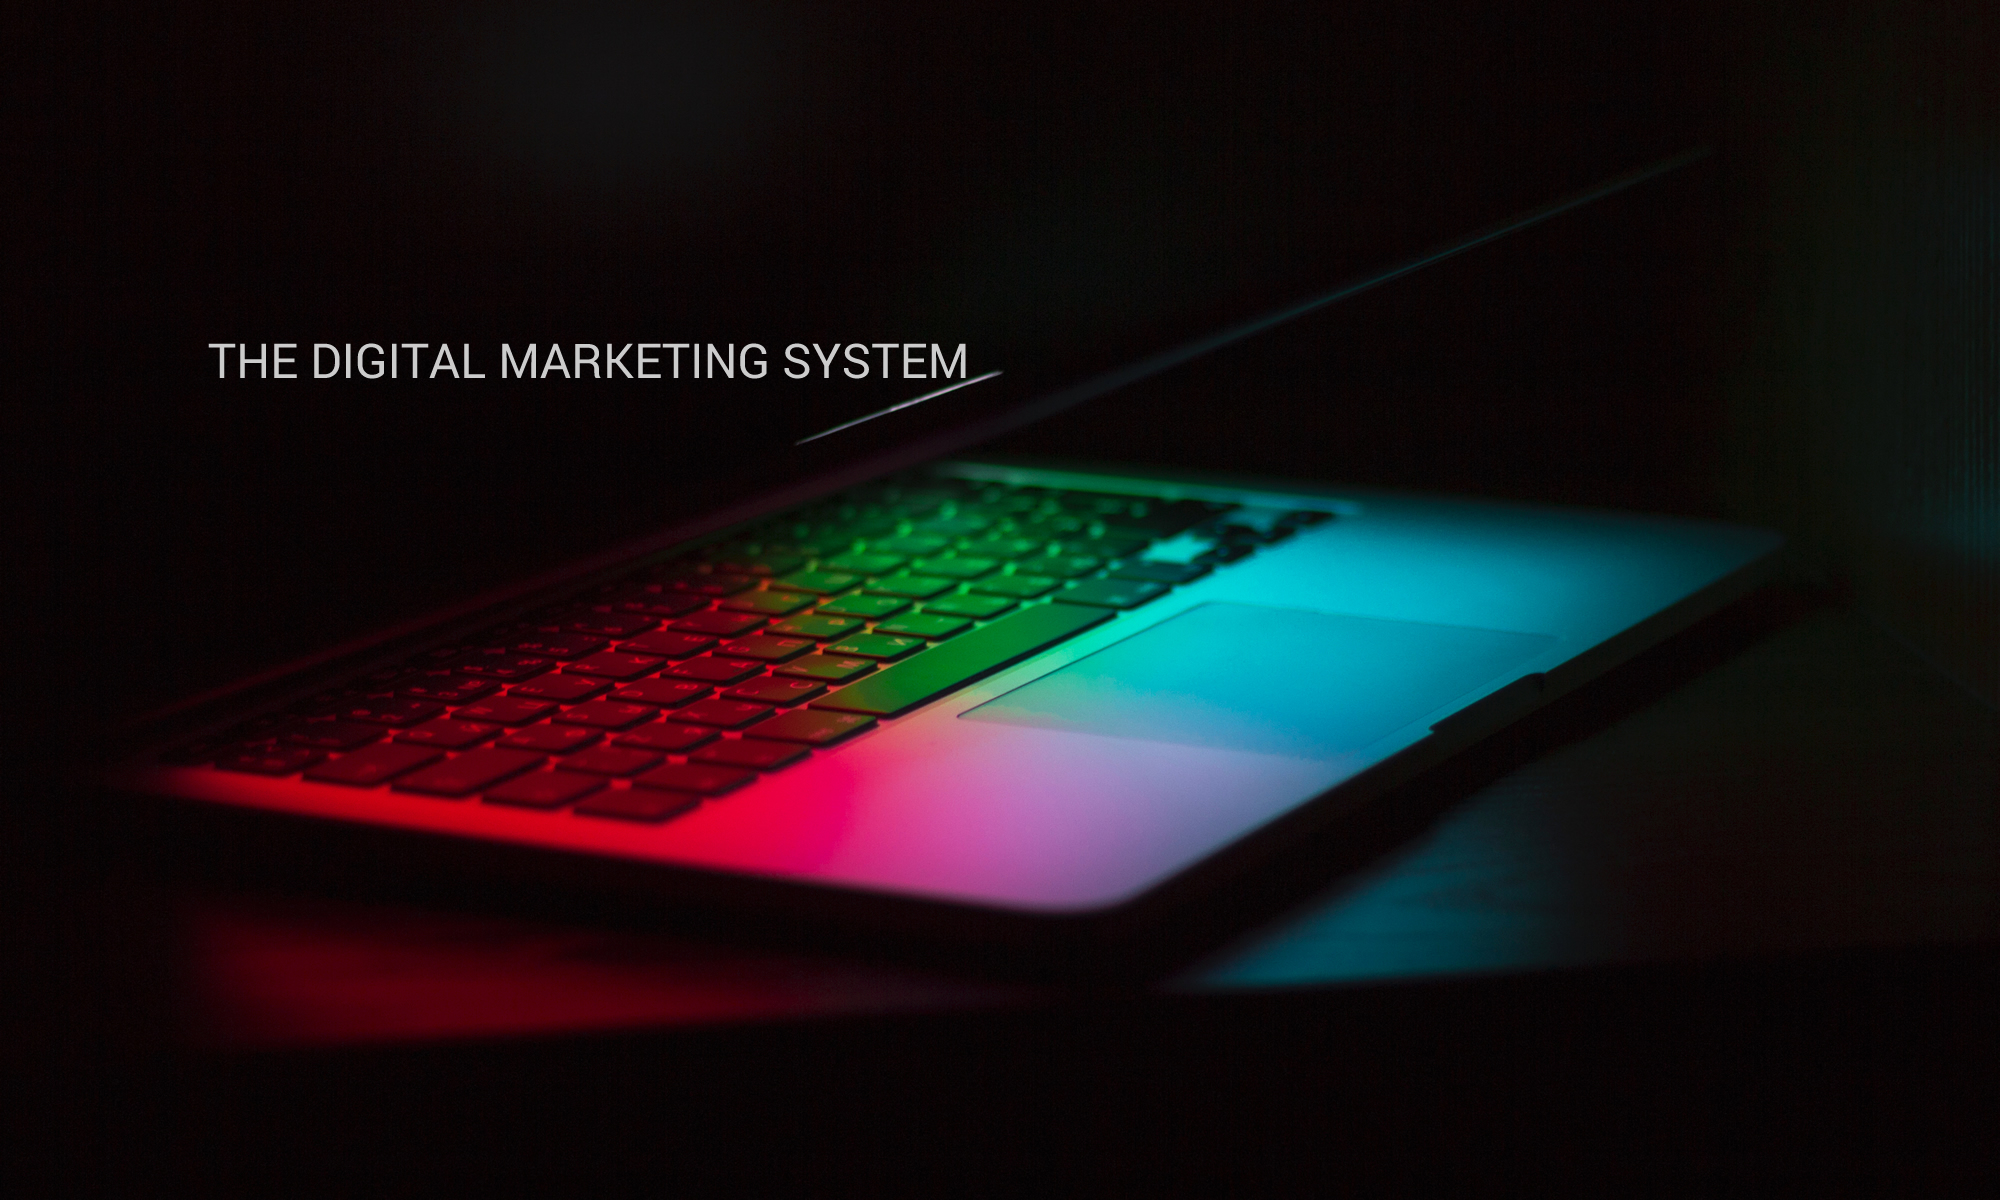 The Digital Marketing System